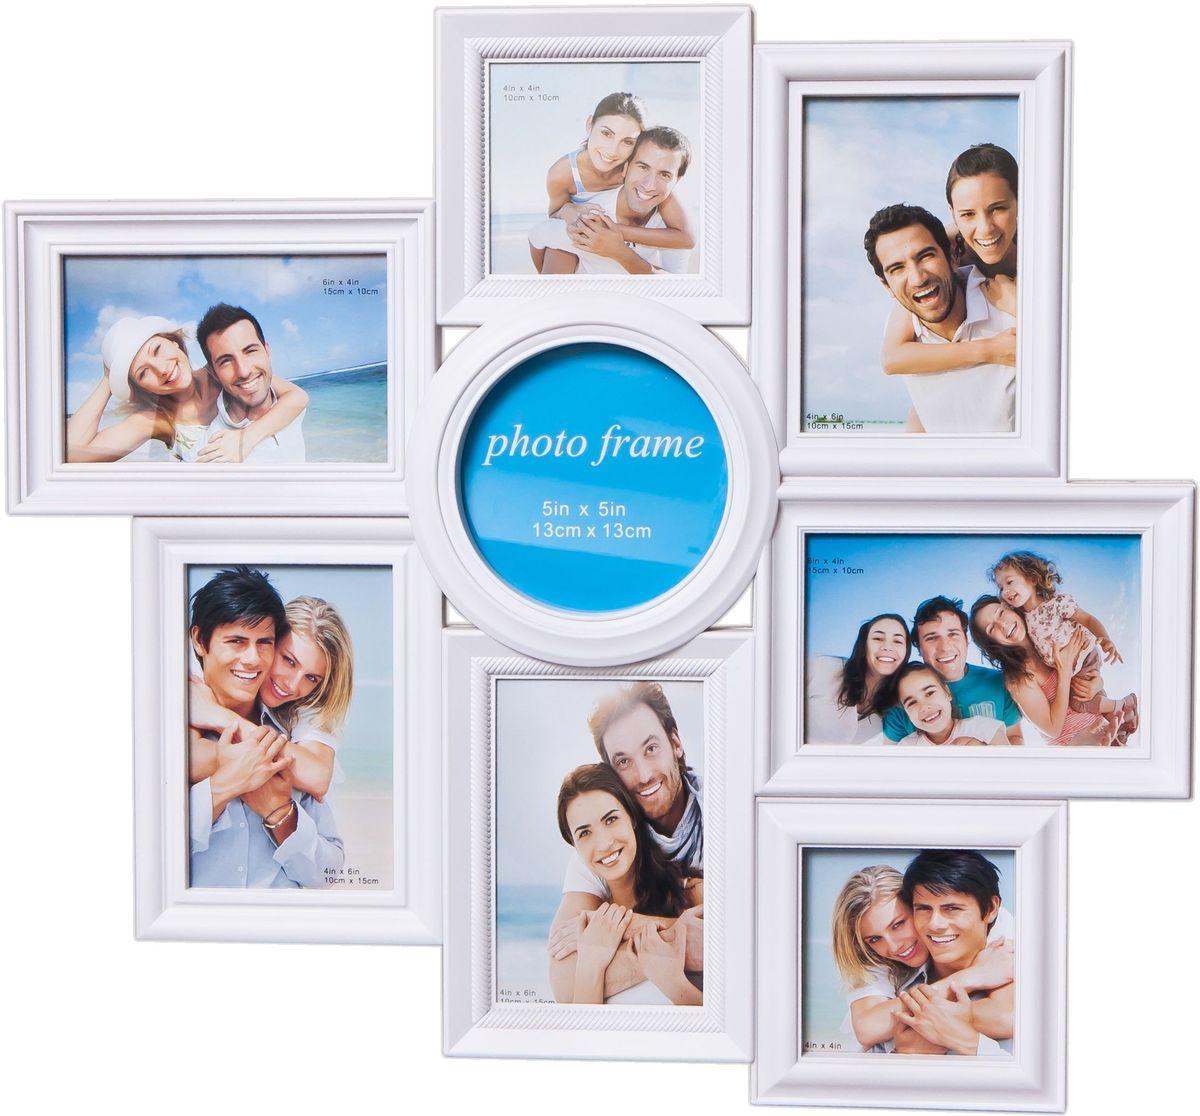 Коллаж Platinum, цвет: белый, 8 фоторамок. BH-1408PLATINUM BH-1408-White-БелыйПластиковый коллаж с 5 фото 10х15 см, 1 фото 13х13 см, 2 фото 10х10.